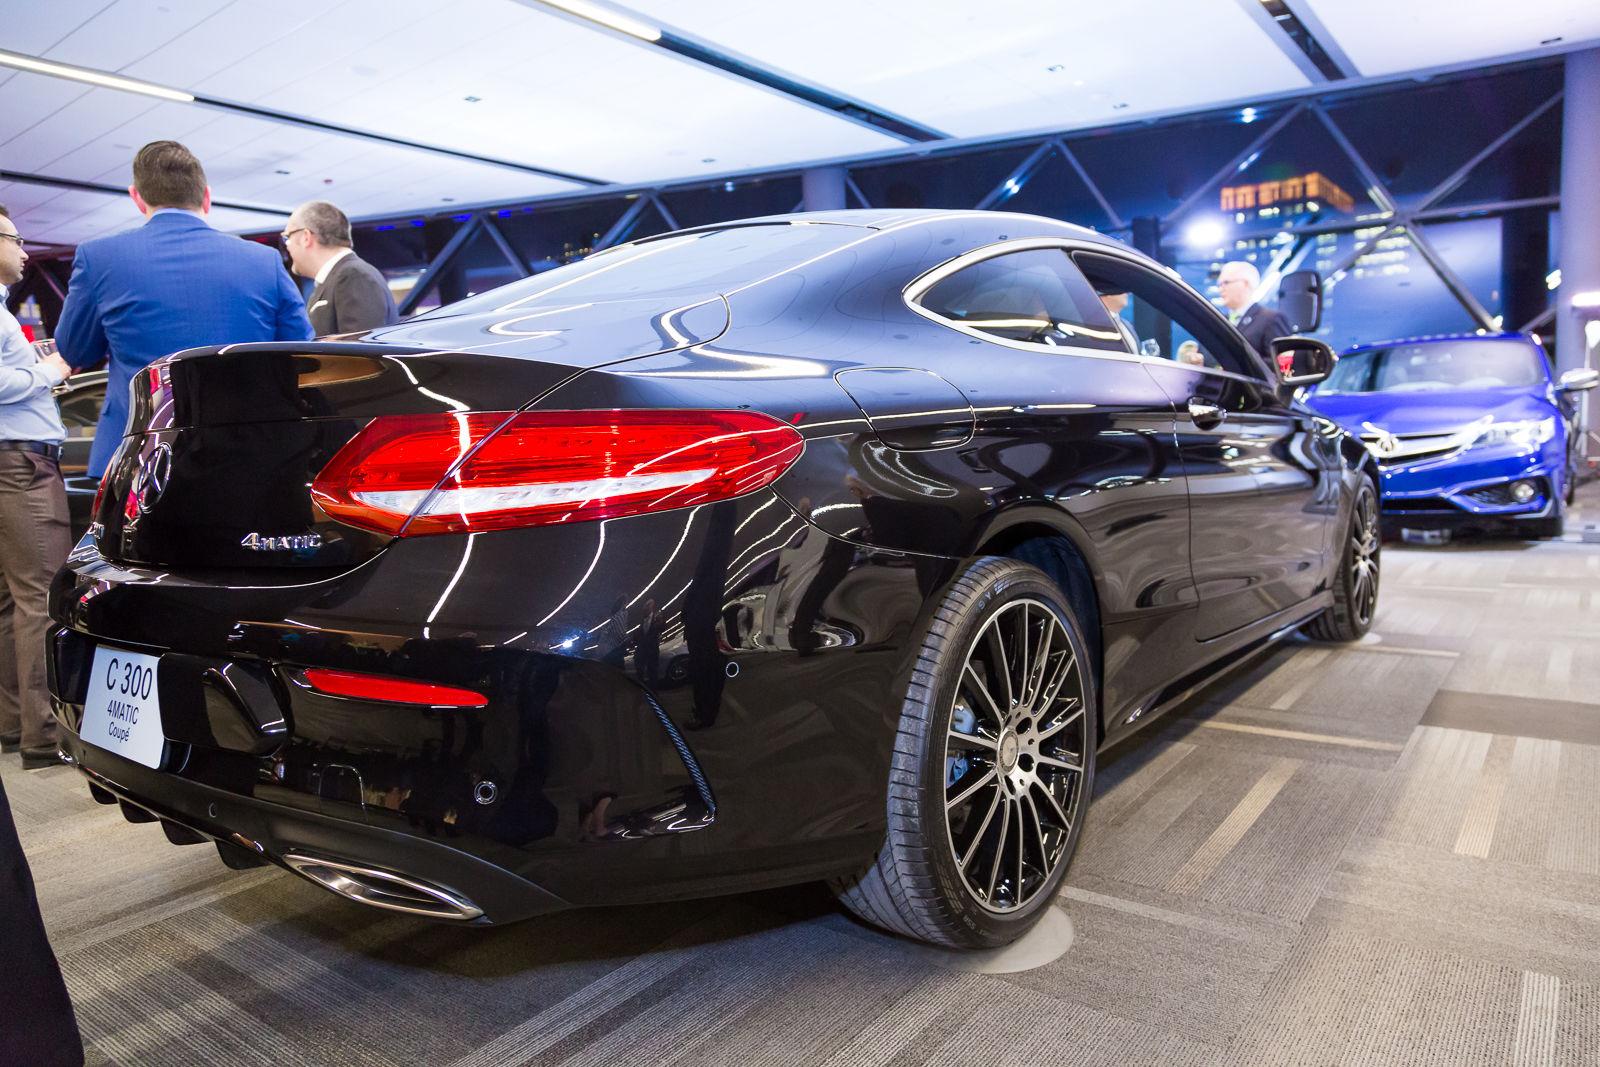 Ottawa auto show 2016 mercedes benz c class coupe for Mercedes benz c class coupe 2016